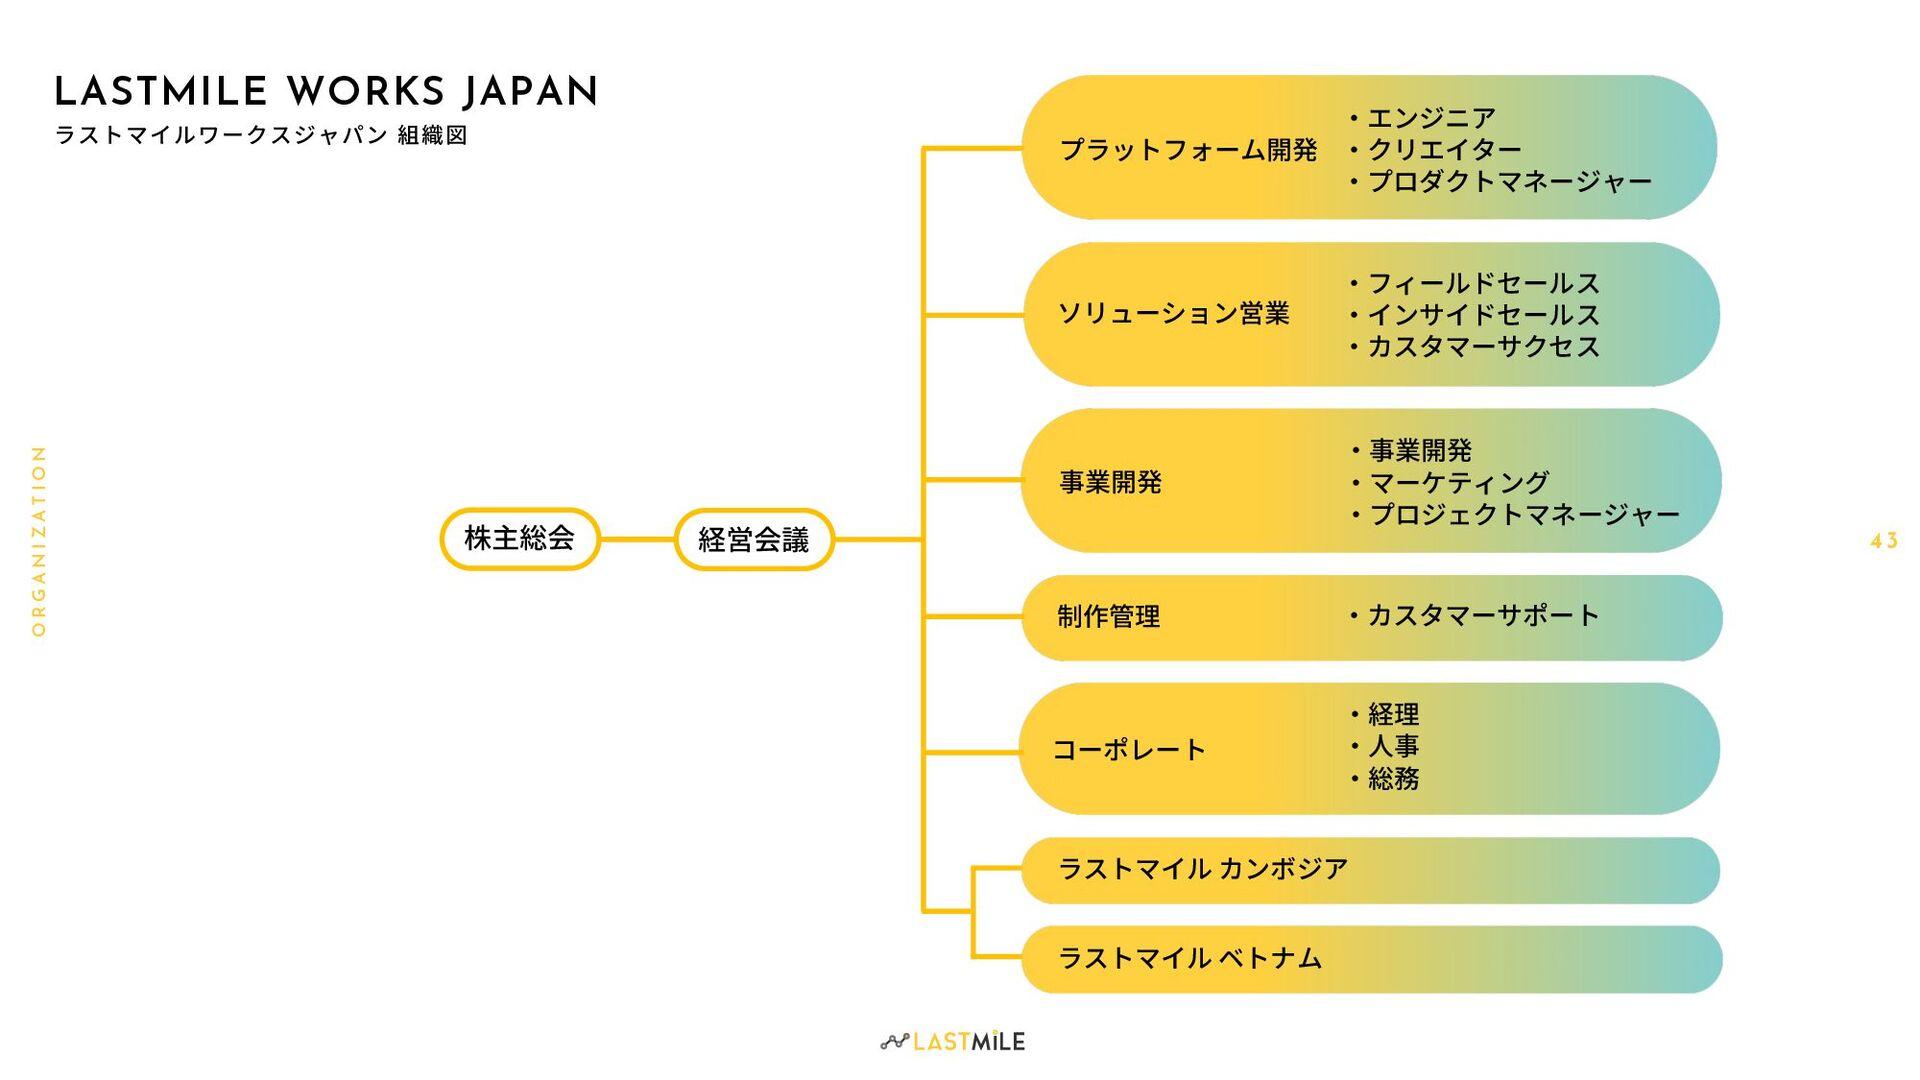 4 3 O R G A N I Z A T I O N LASTMILE WORKS JAPAN